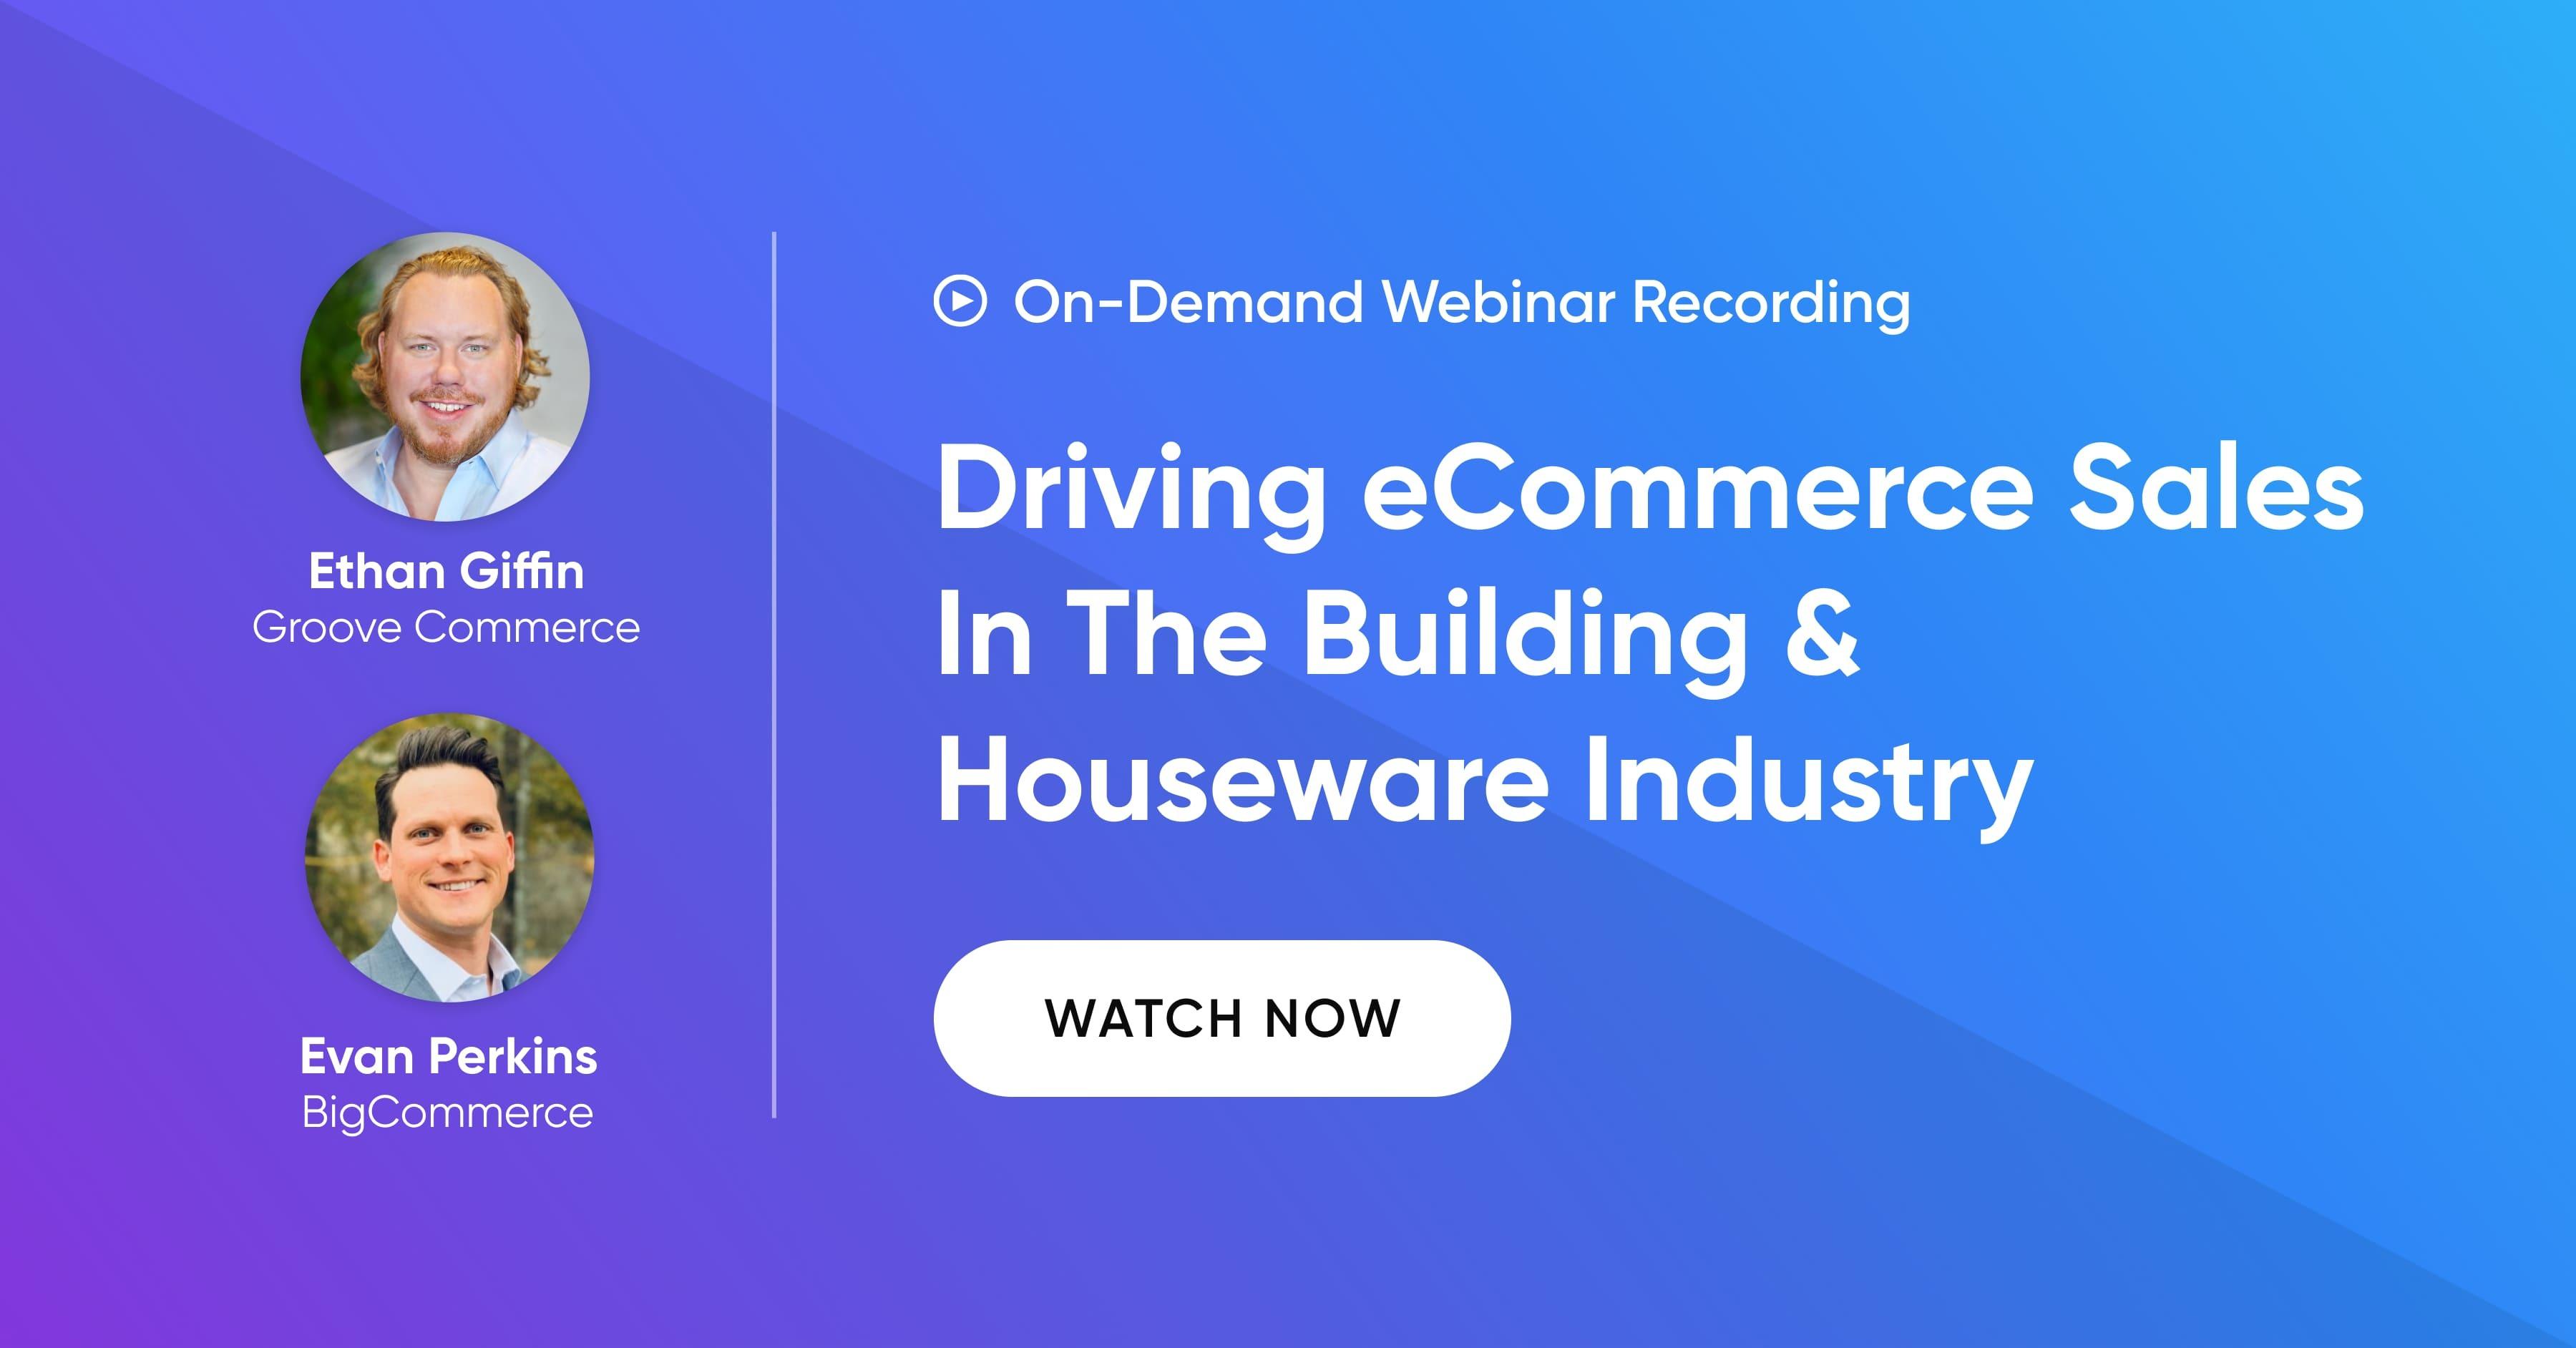 Home & Building Webinar - Recording